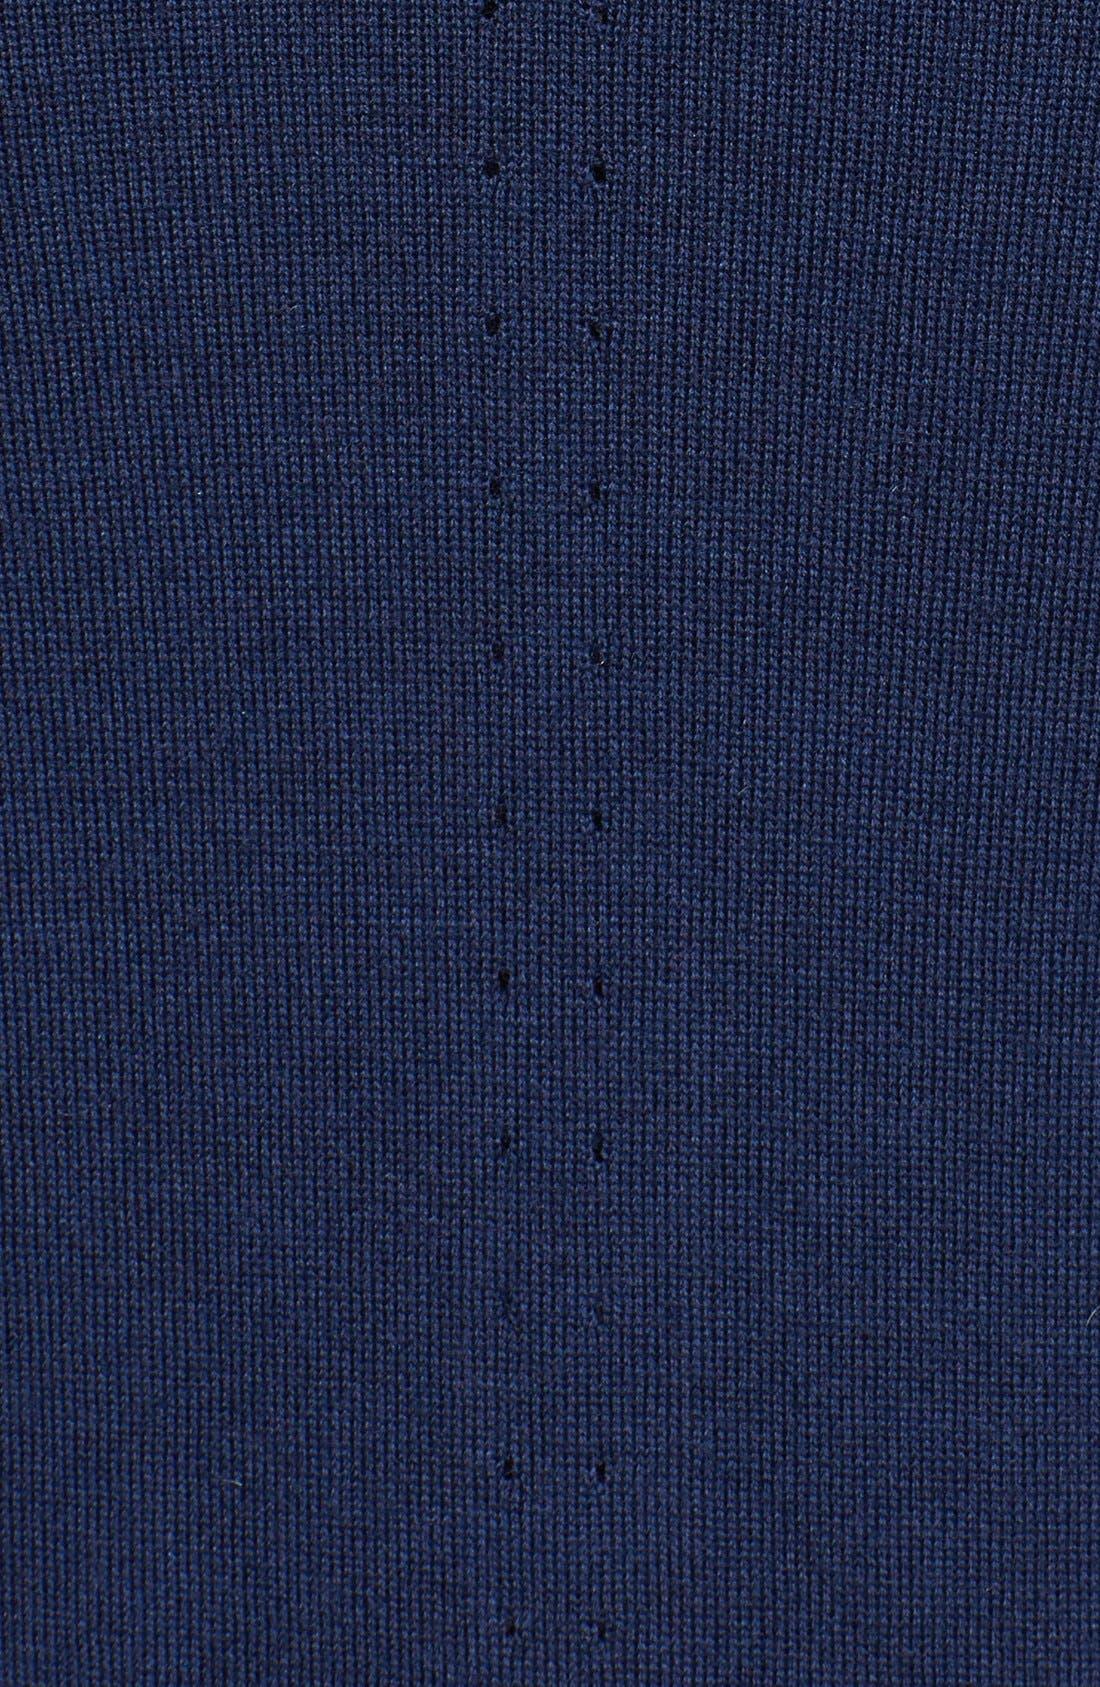 Alternate Image 3  - Vince Camuto Slim Fit Merino Wool Cardigan